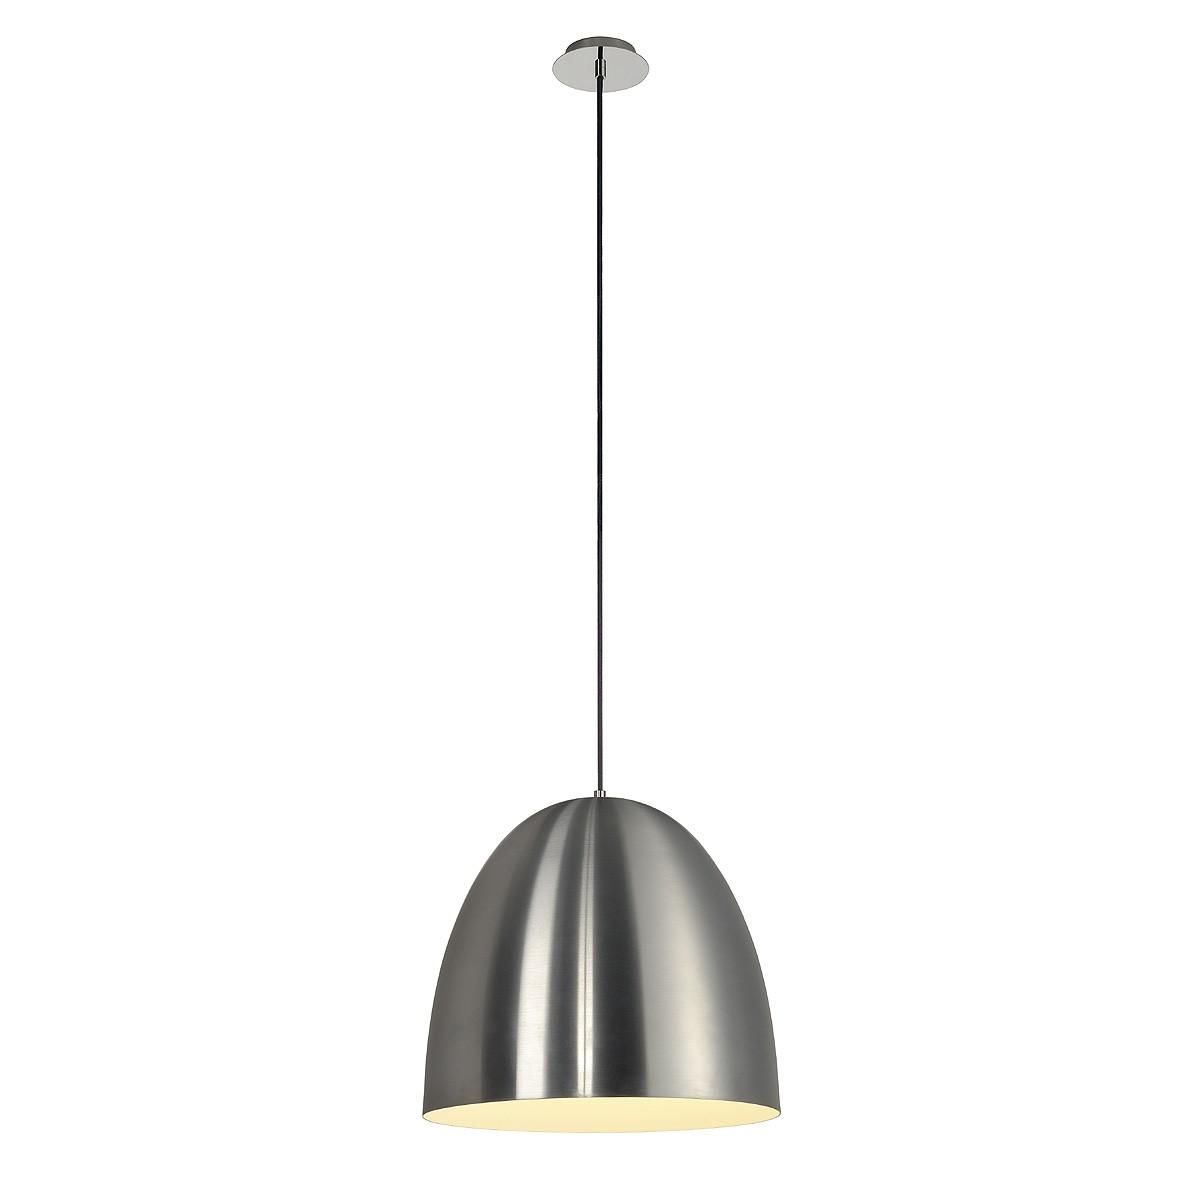 intalite para kegel 40 anh nger geb rstetes aluminium 60w e27 40cm ebay. Black Bedroom Furniture Sets. Home Design Ideas